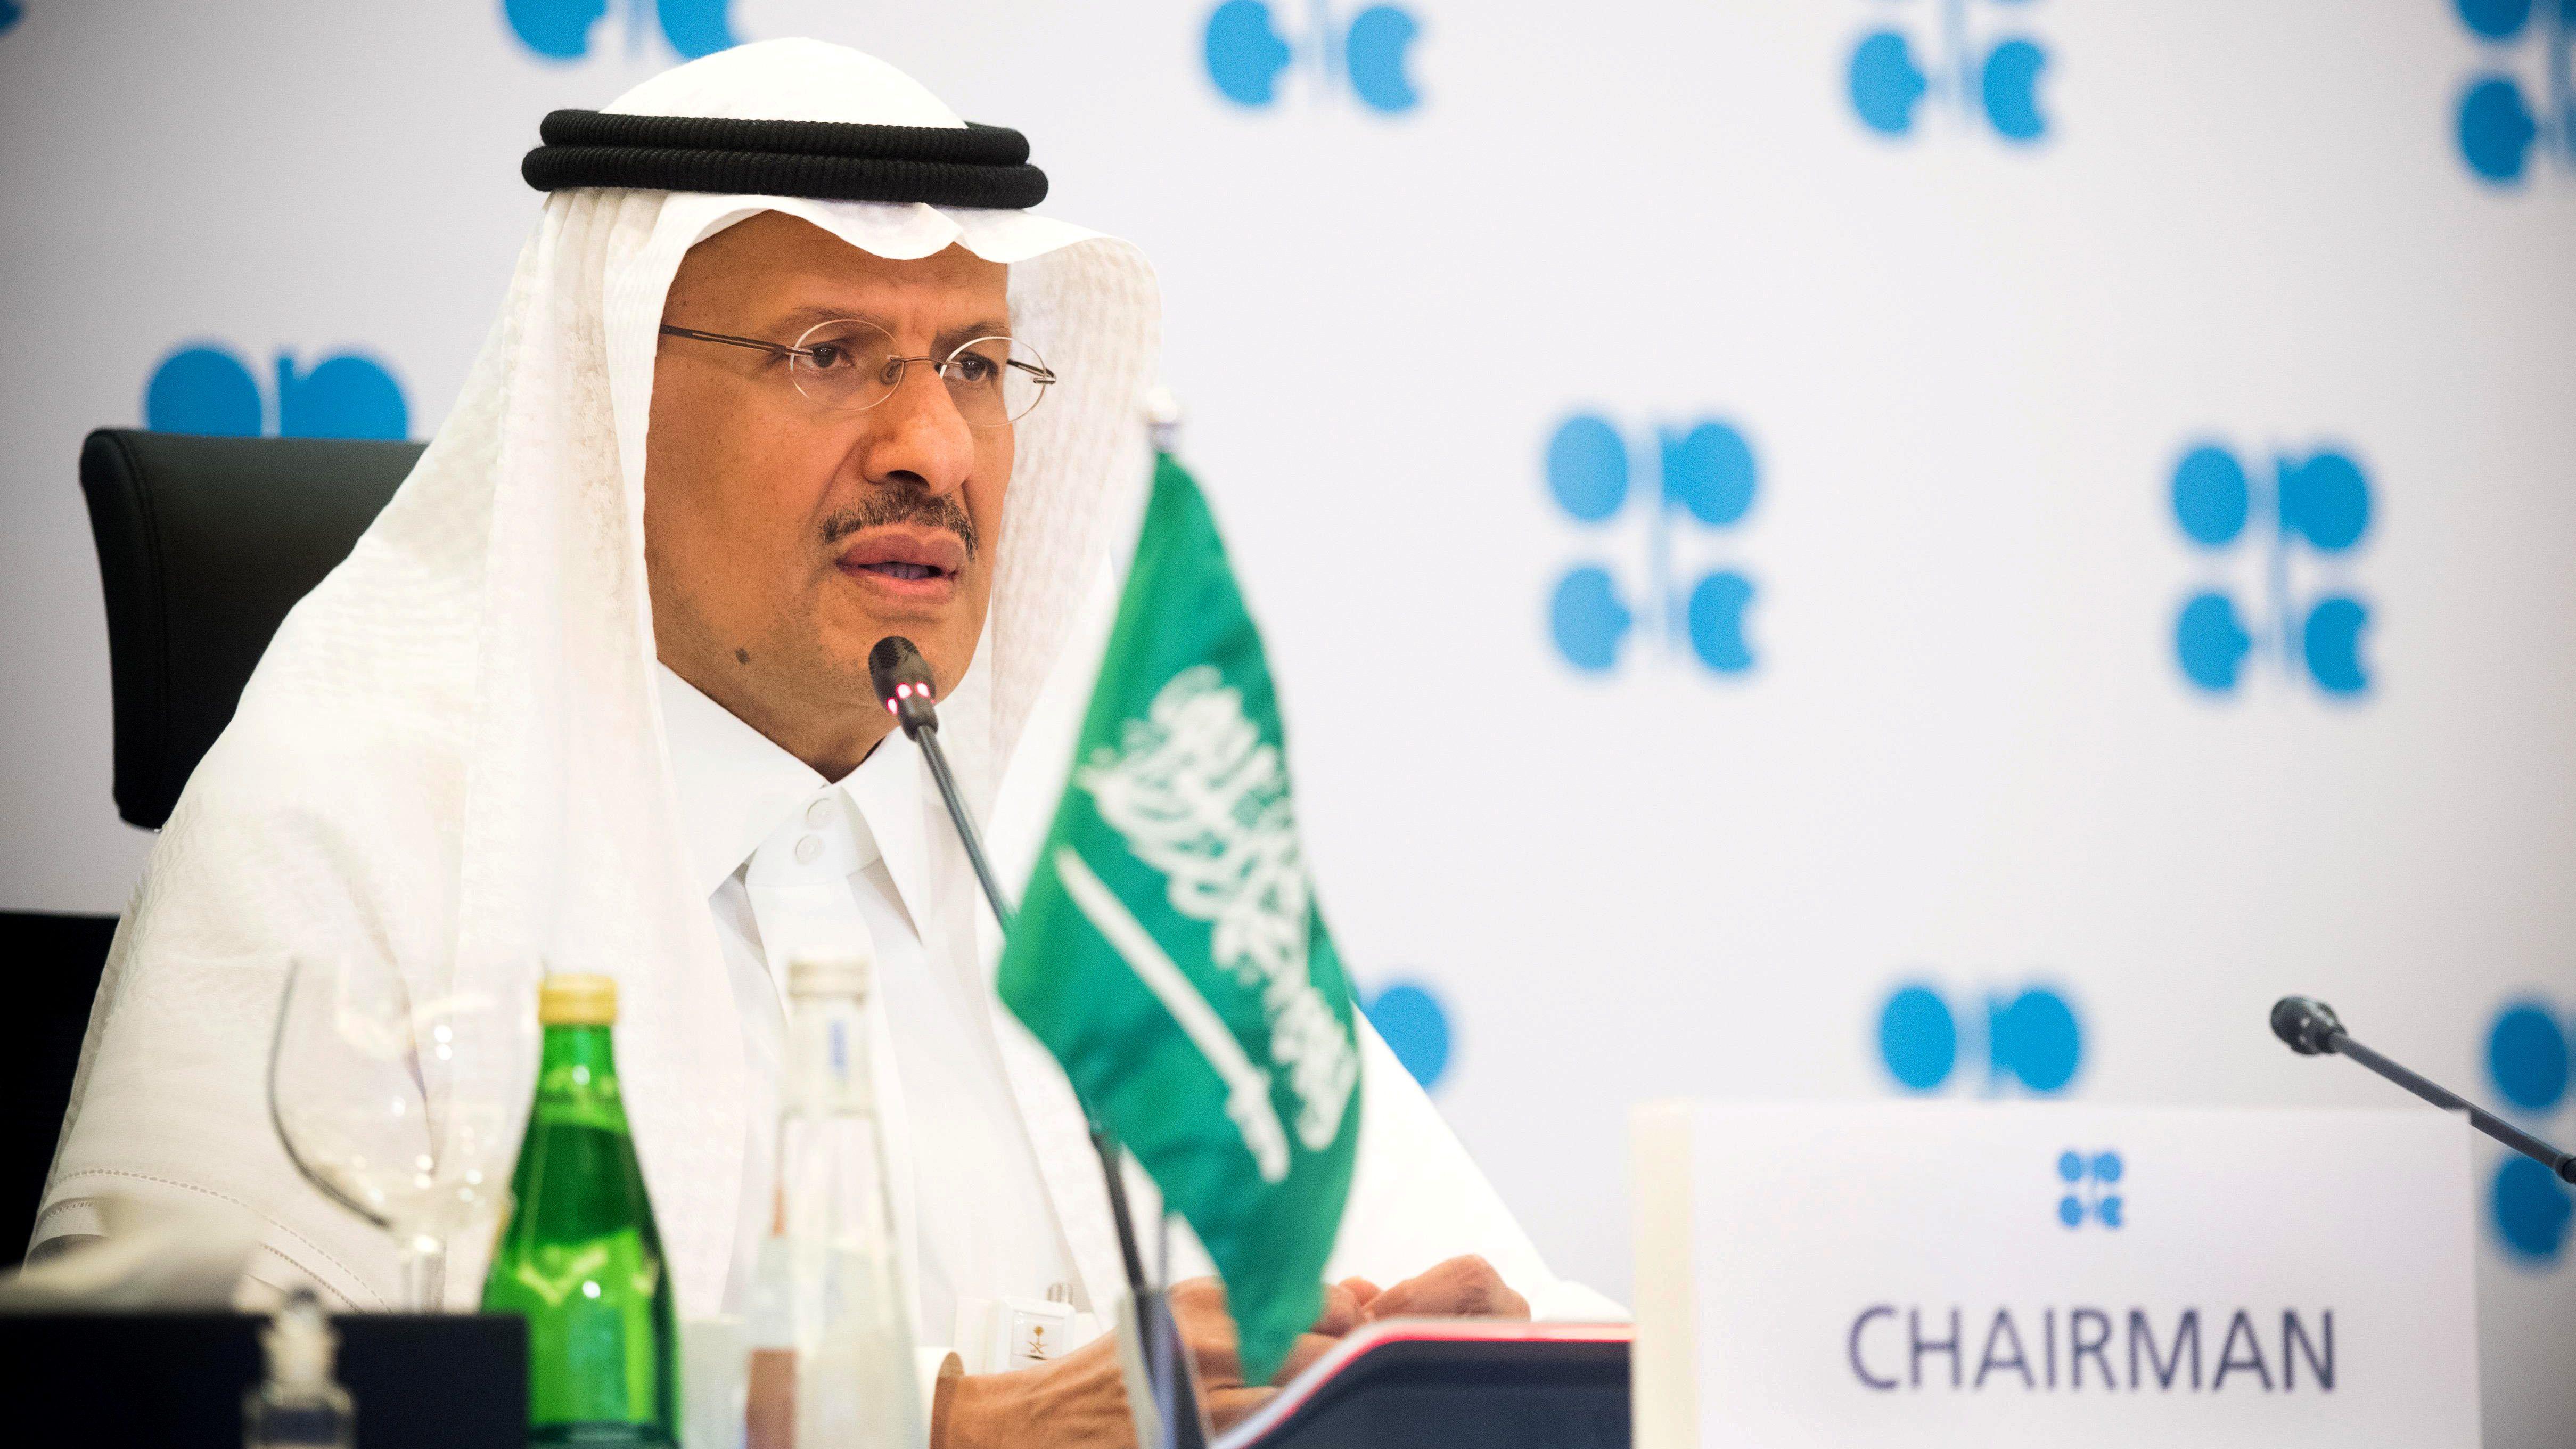 Saudi Arabia's Minister of Energy Prince Abdulaziz bin Salman Al-Saud speaks via video link during a virtual emergency meeting of OPEC and non-OPEC countries, following the outbreak of the coronavirus disease (COVID-19), in Riyadh